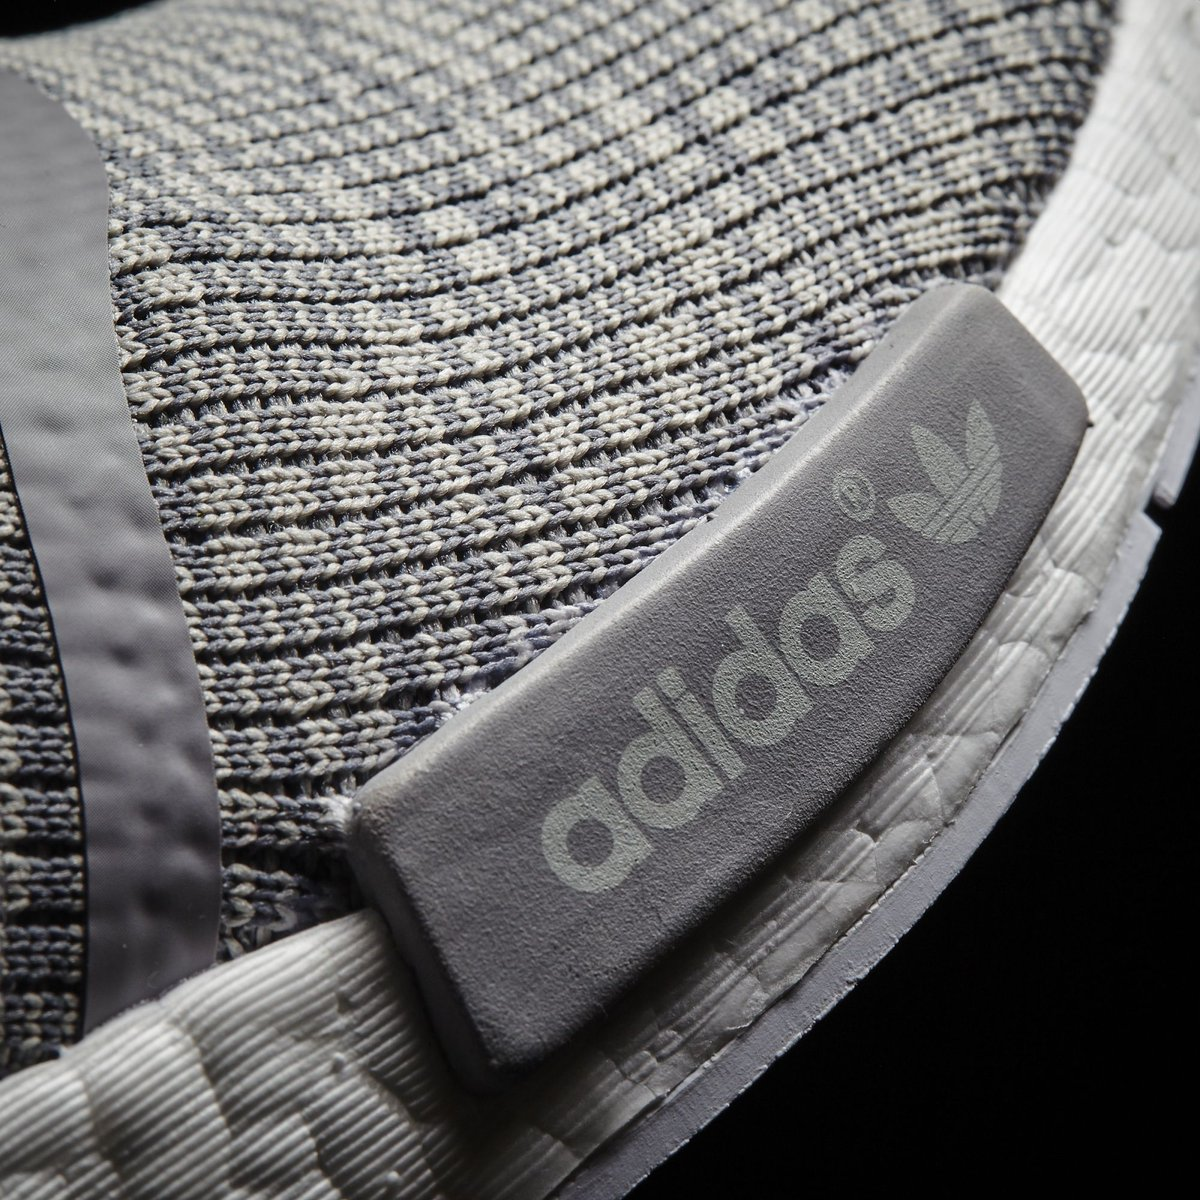 3c7fa75c5 adidas alerts on Twitter